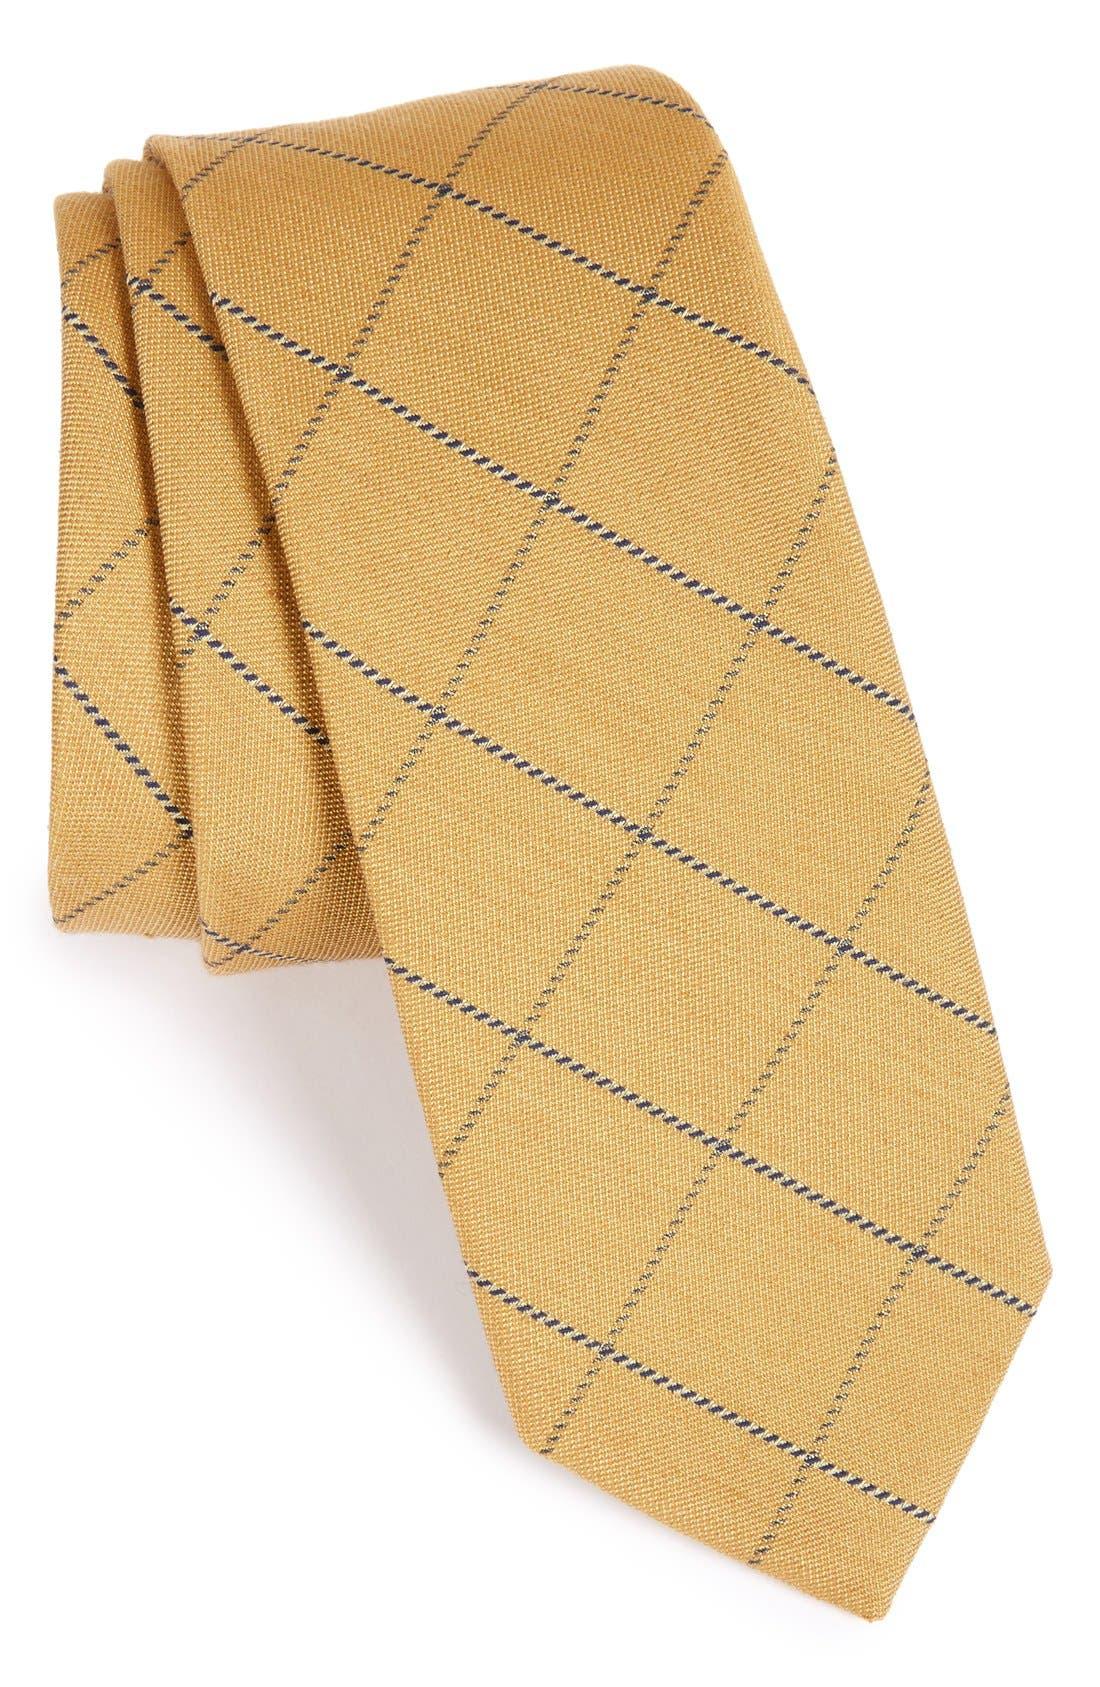 Main Image - The Tie Bar Windowpane Wool & Silk Tie